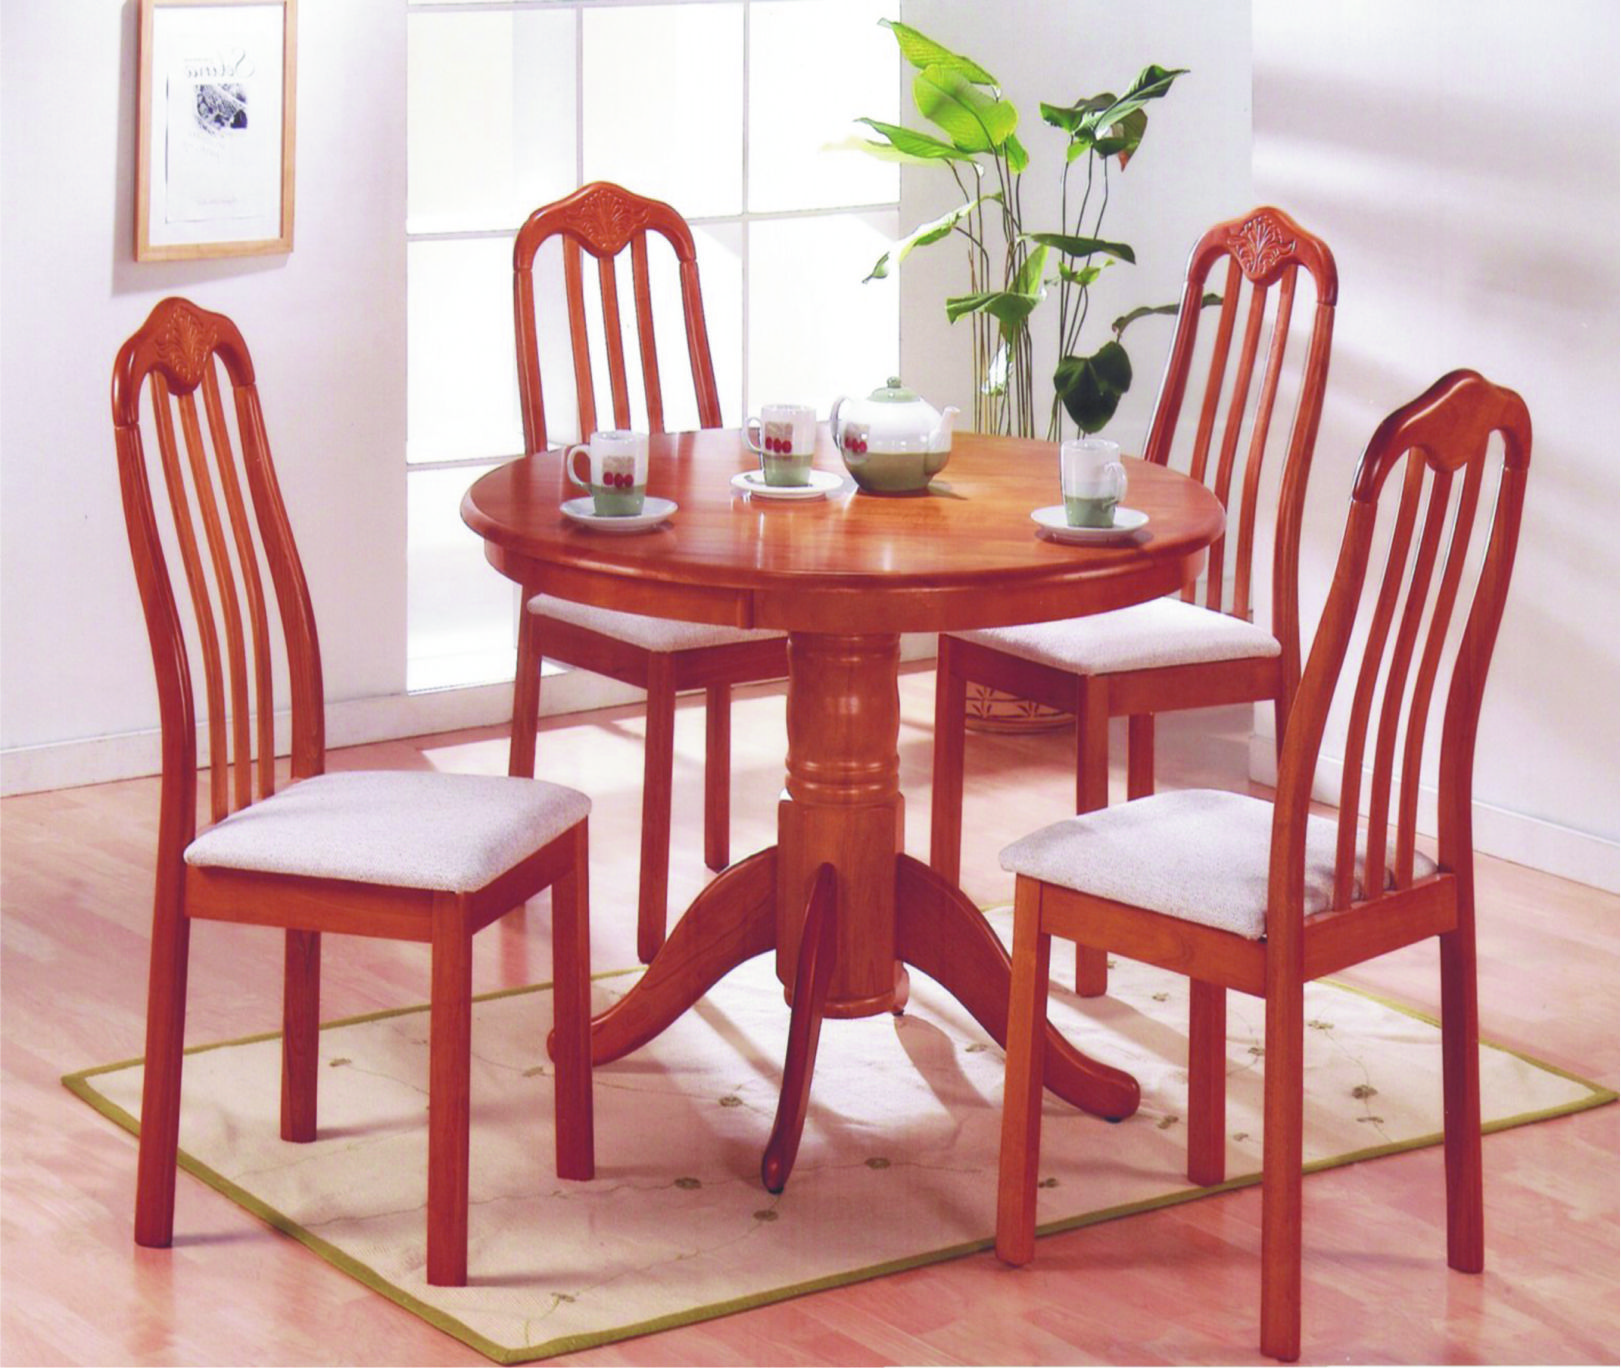 Buy High Quality Furniture At Affordable Price At Zuari Furniture